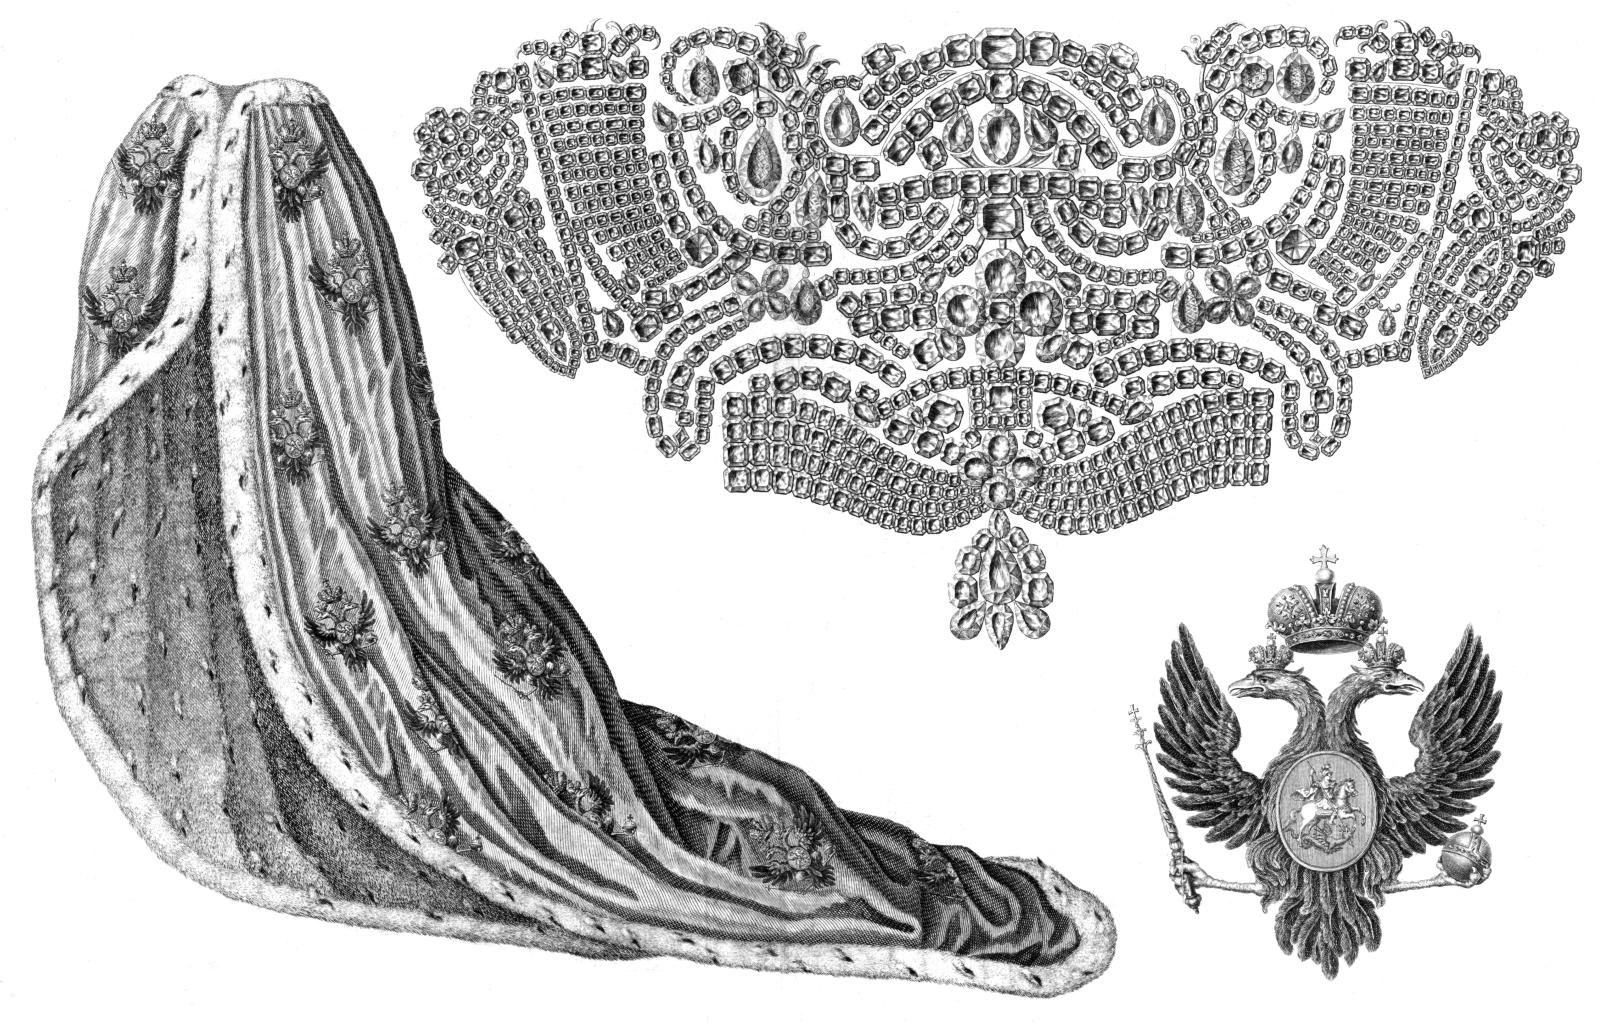 22. Х.А. Вортман. № 19. Императорская мантия. № 20. Аграф, или запона мантии. 1744 Резец. 35,5 х 49